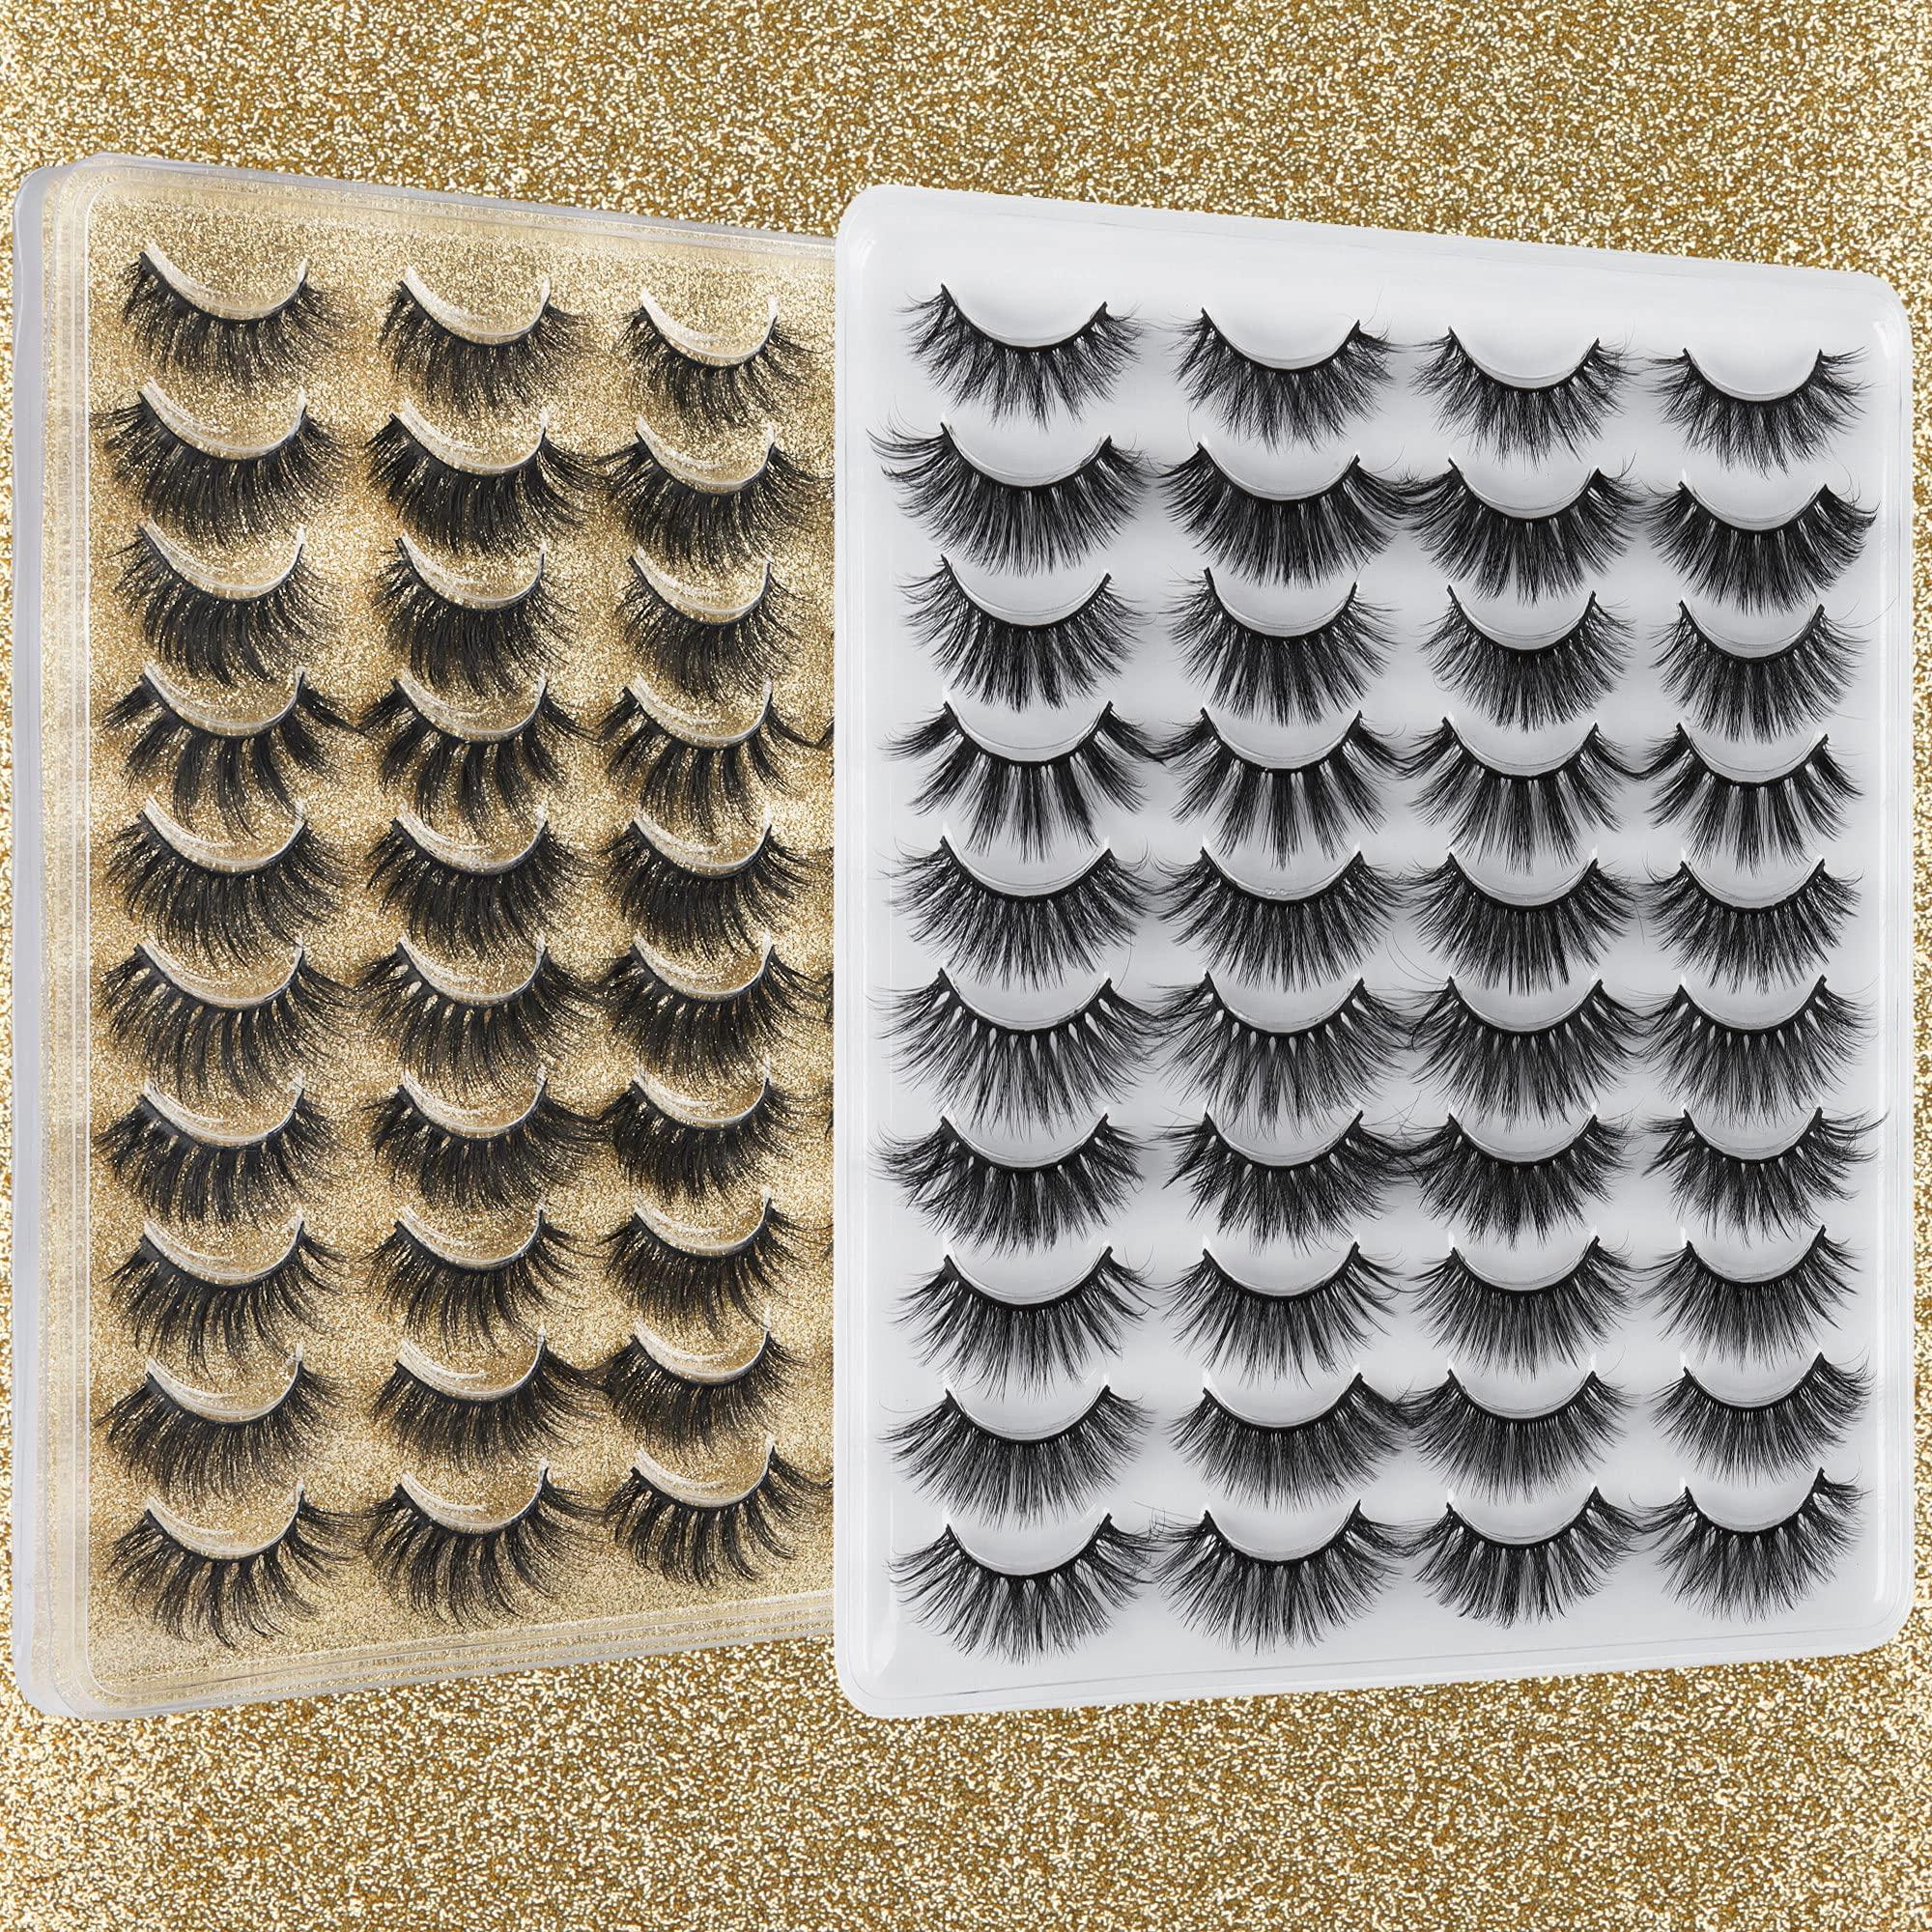 3D False Eyelashes 17-20MM Wispy Faux Mink Lashes ALPHONSE Natural Look Crossed Strip Fake Eyelashes 20 Pairs 10 Styles Mixed